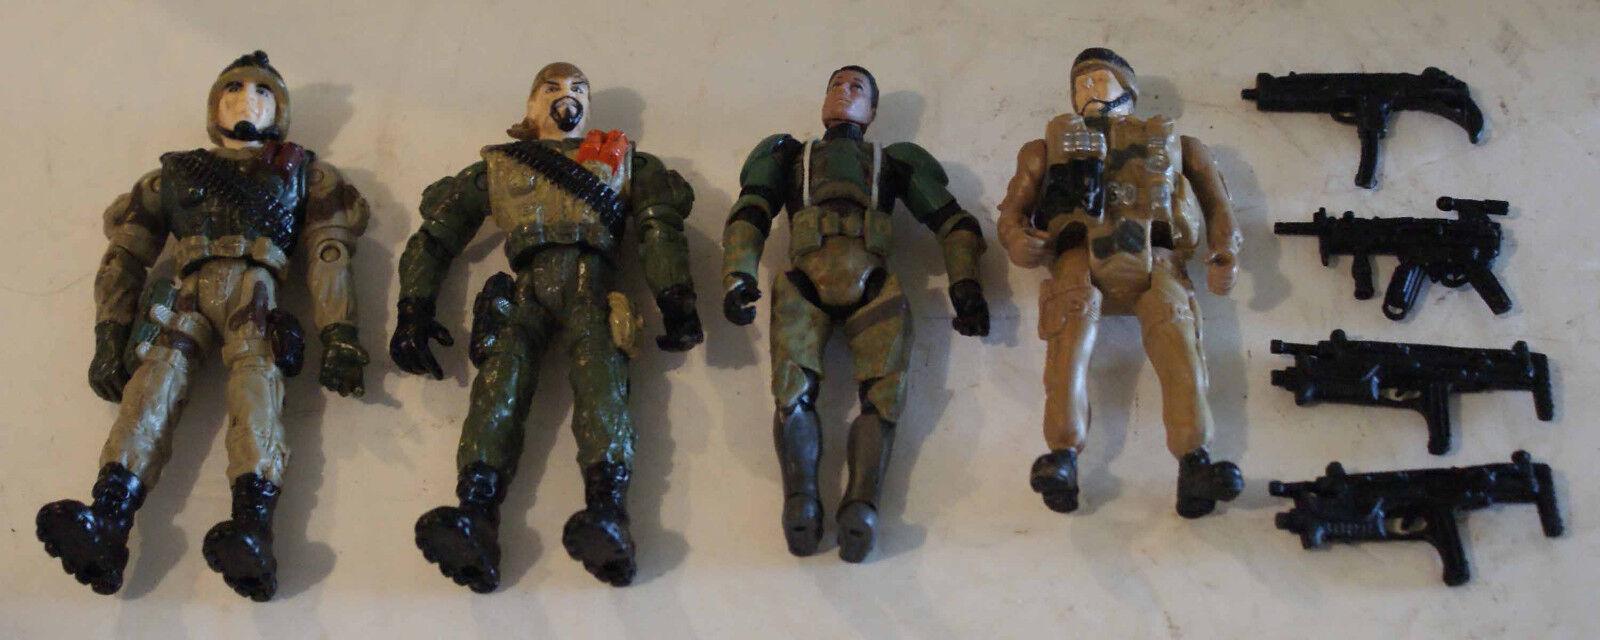 SEAL Team Six, 4 man squad, Marine Corps Fighter Squad, Ranger, Green Beret.